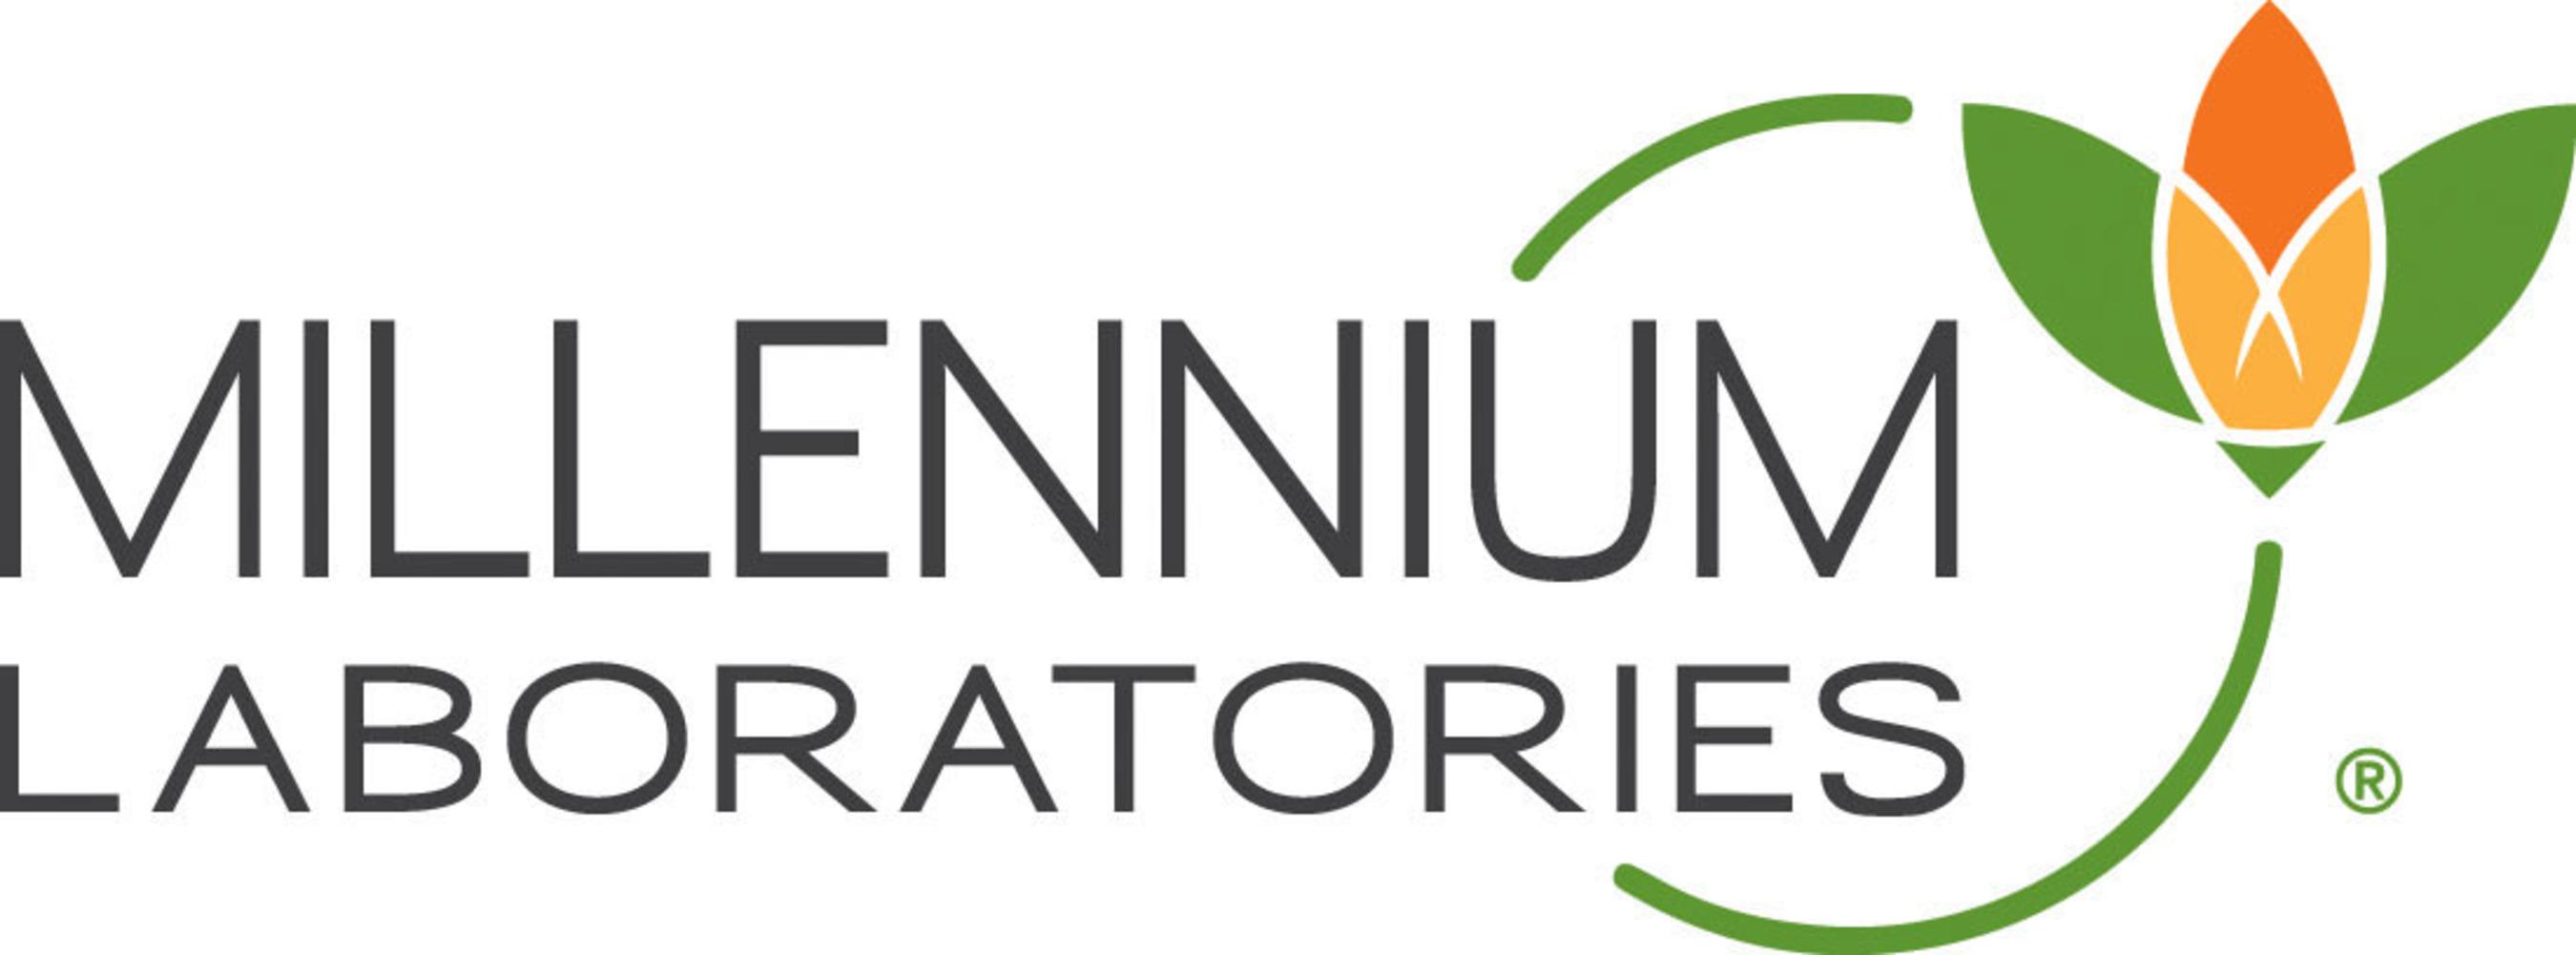 Millennium Laboratories. (PRNewsFoto/Millennium Laboratories, Inc.) (PRNewsFoto/MILLENNIUM LABORATORIES, INC.)